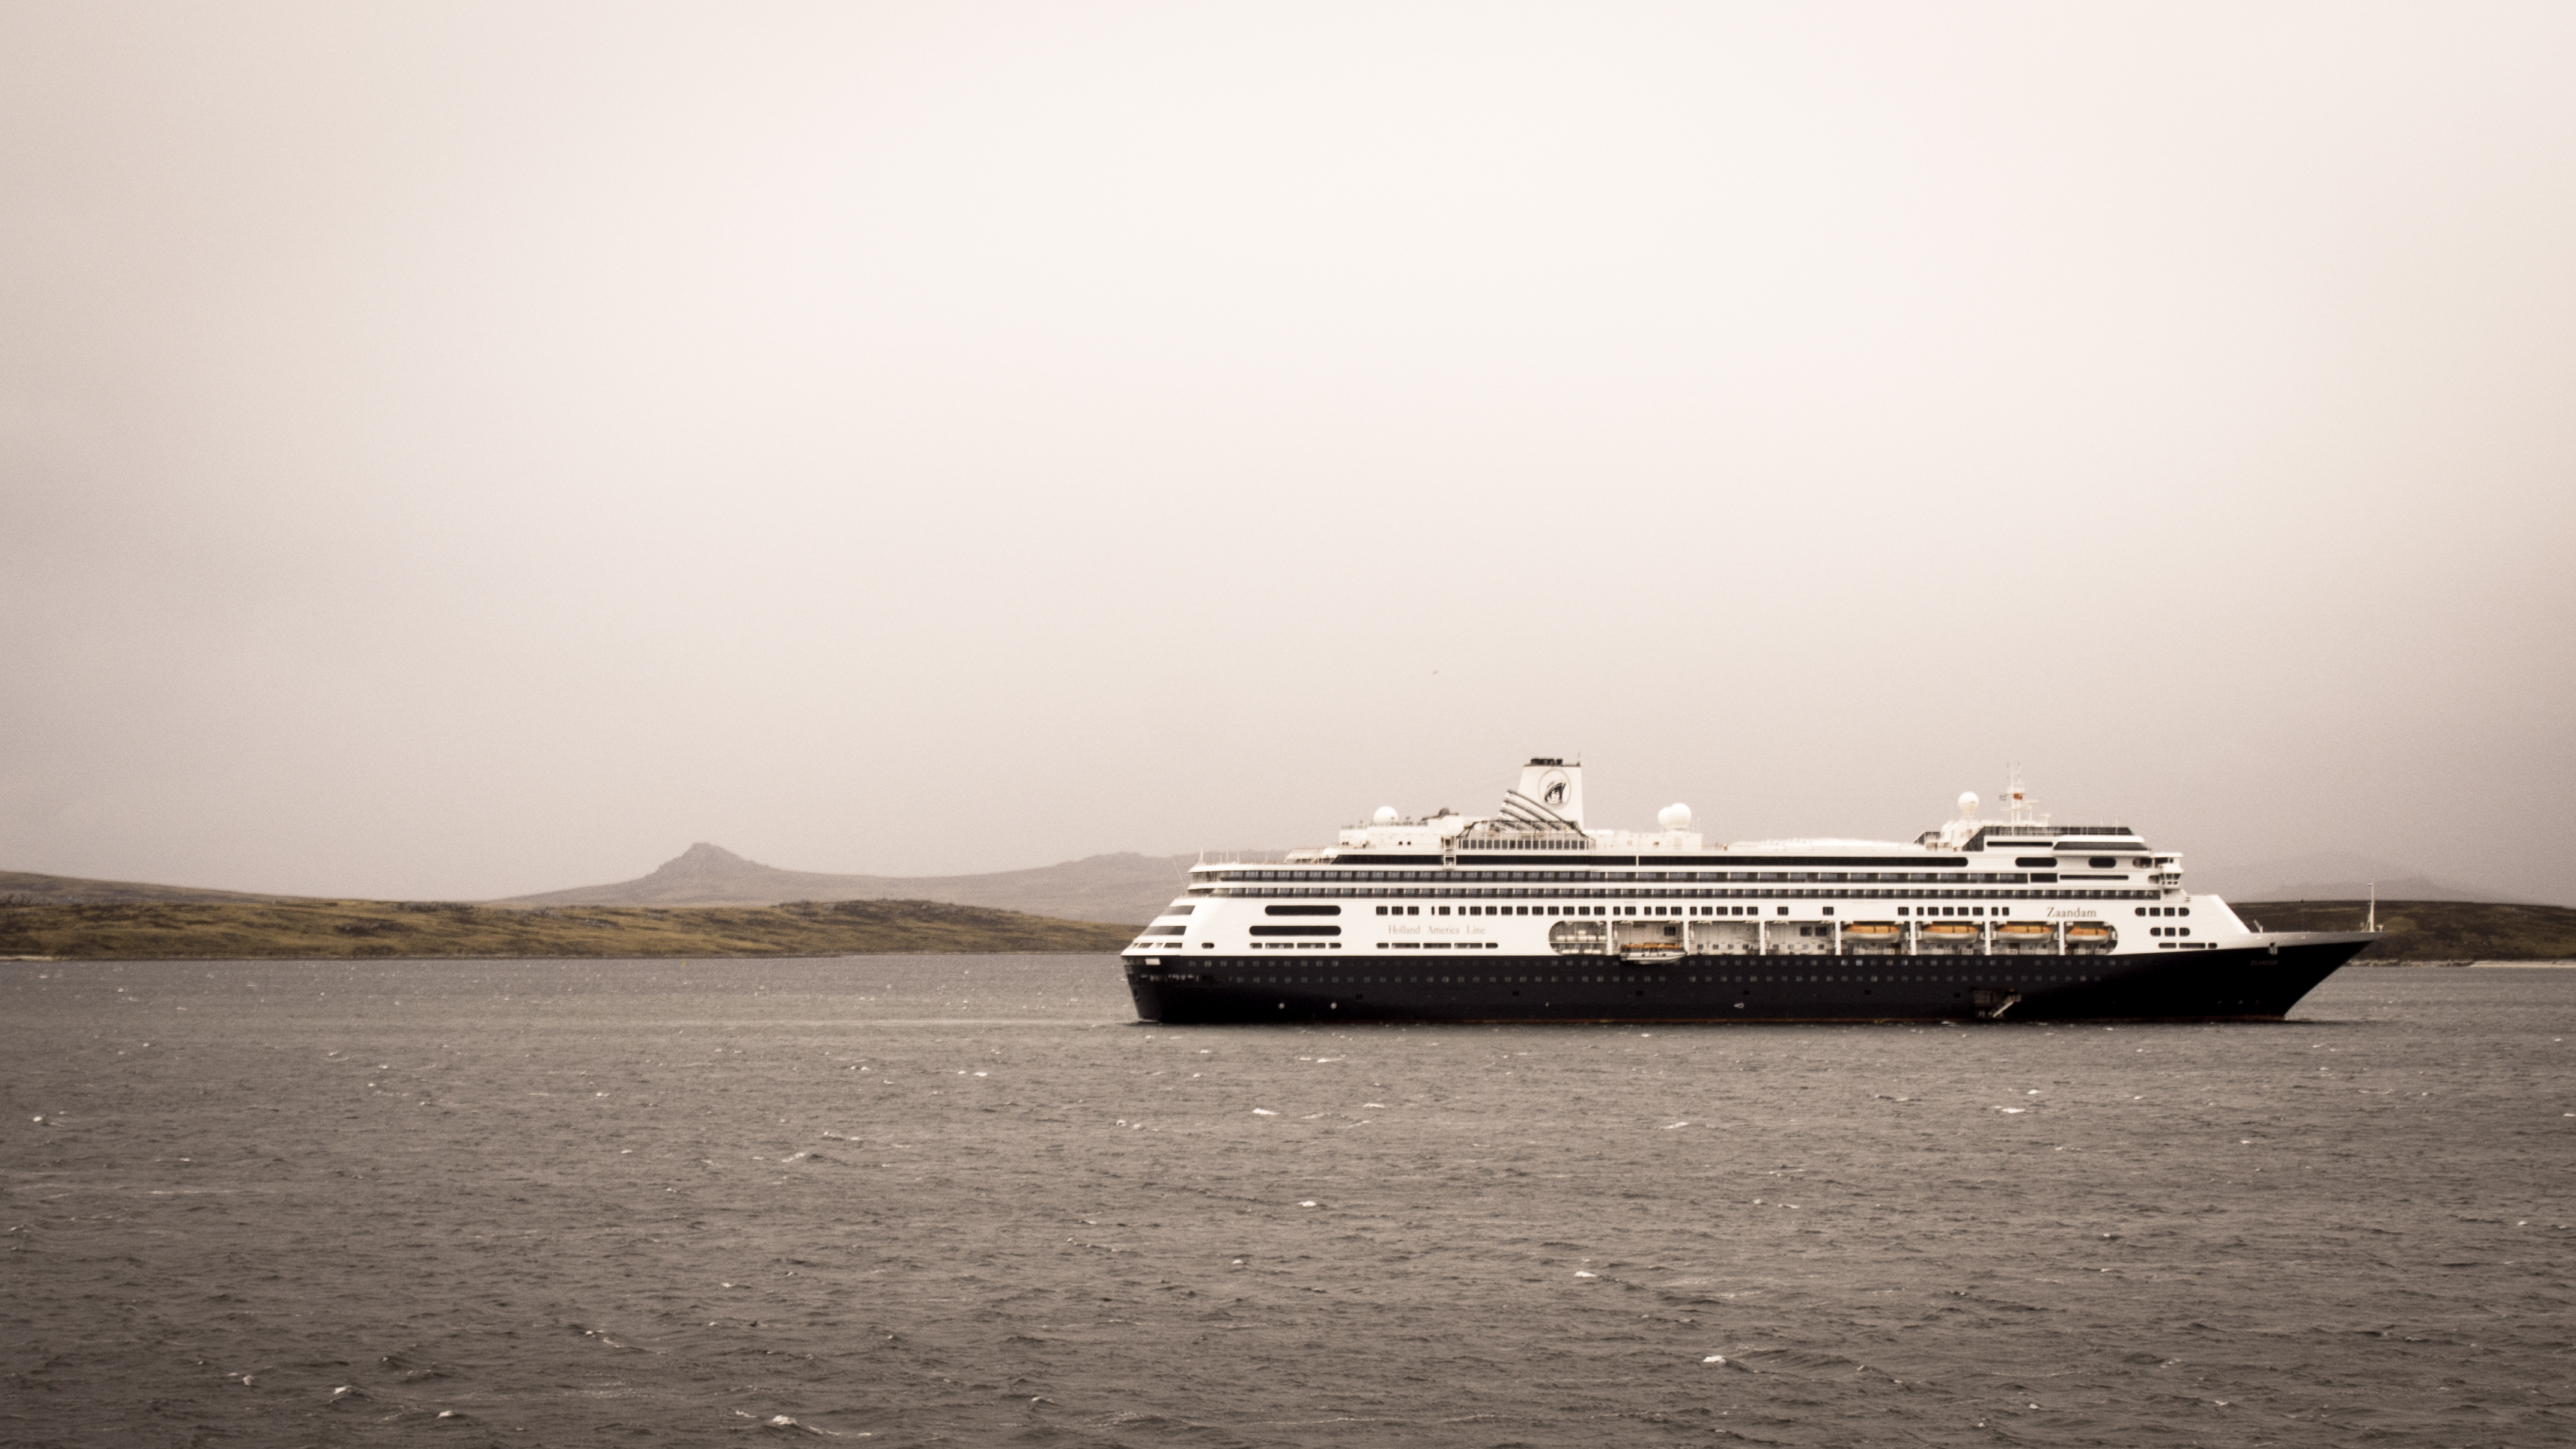 Cruise ship, Azure, Travel, Ship, Sky, HQ Photo